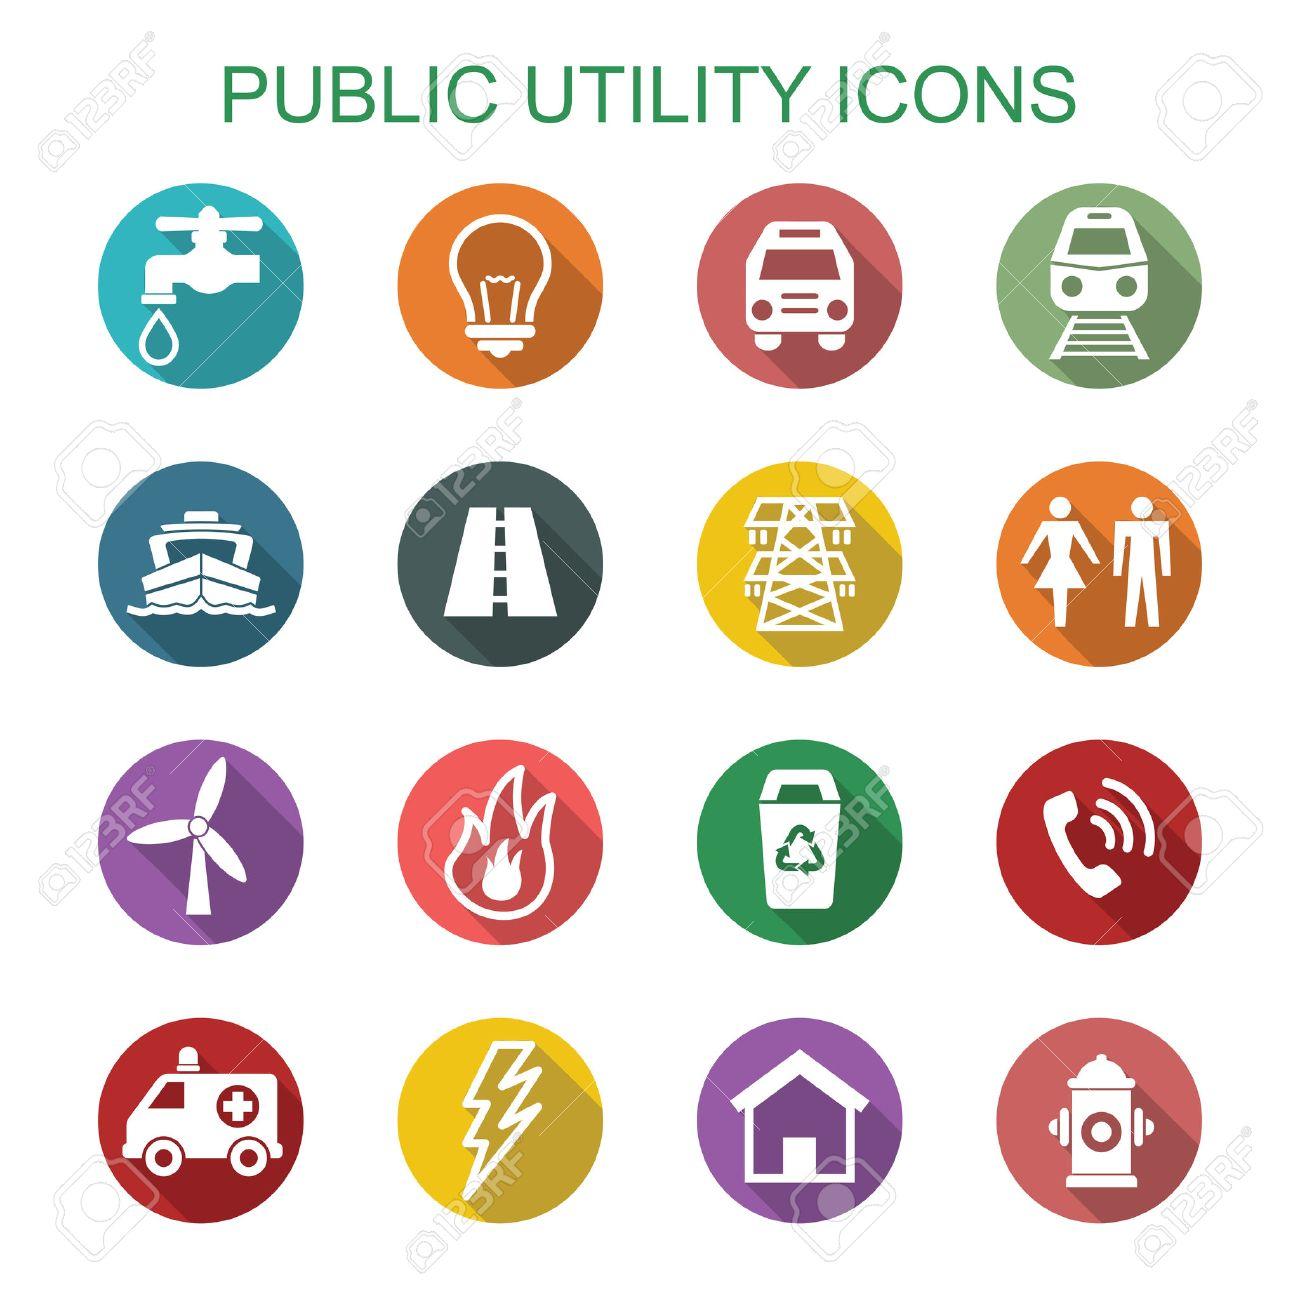 public utility long shadow icons, flat vector symbols - 41657752